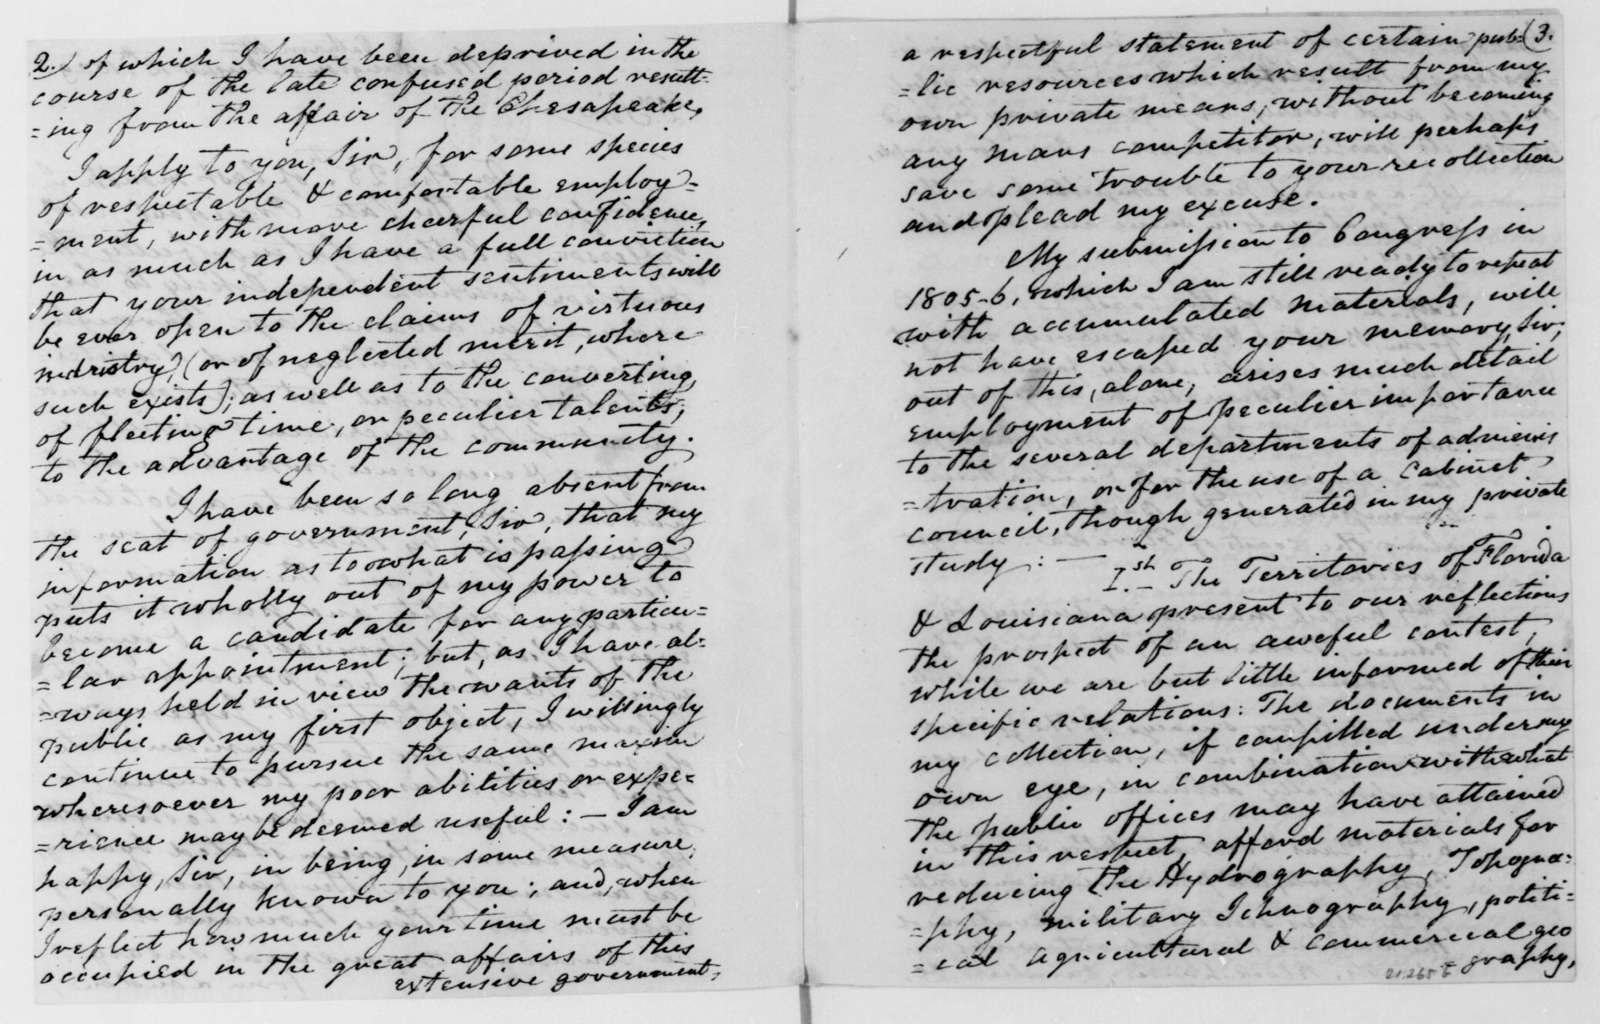 William Tatham to James Madison, August 18, 1809.